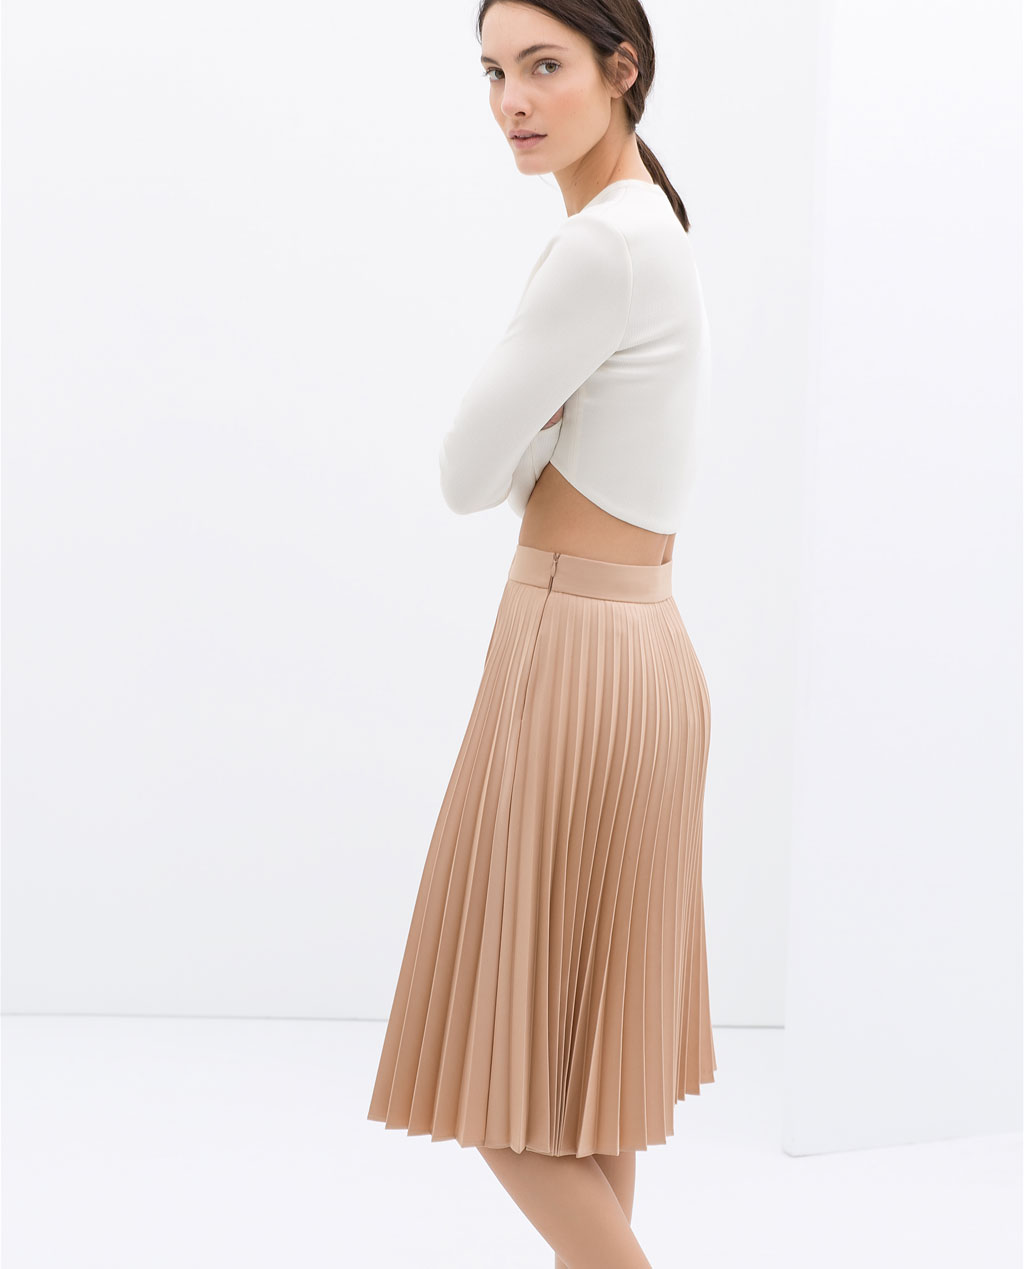 Zara-Look-1-Faltenrock-Cropped-Top